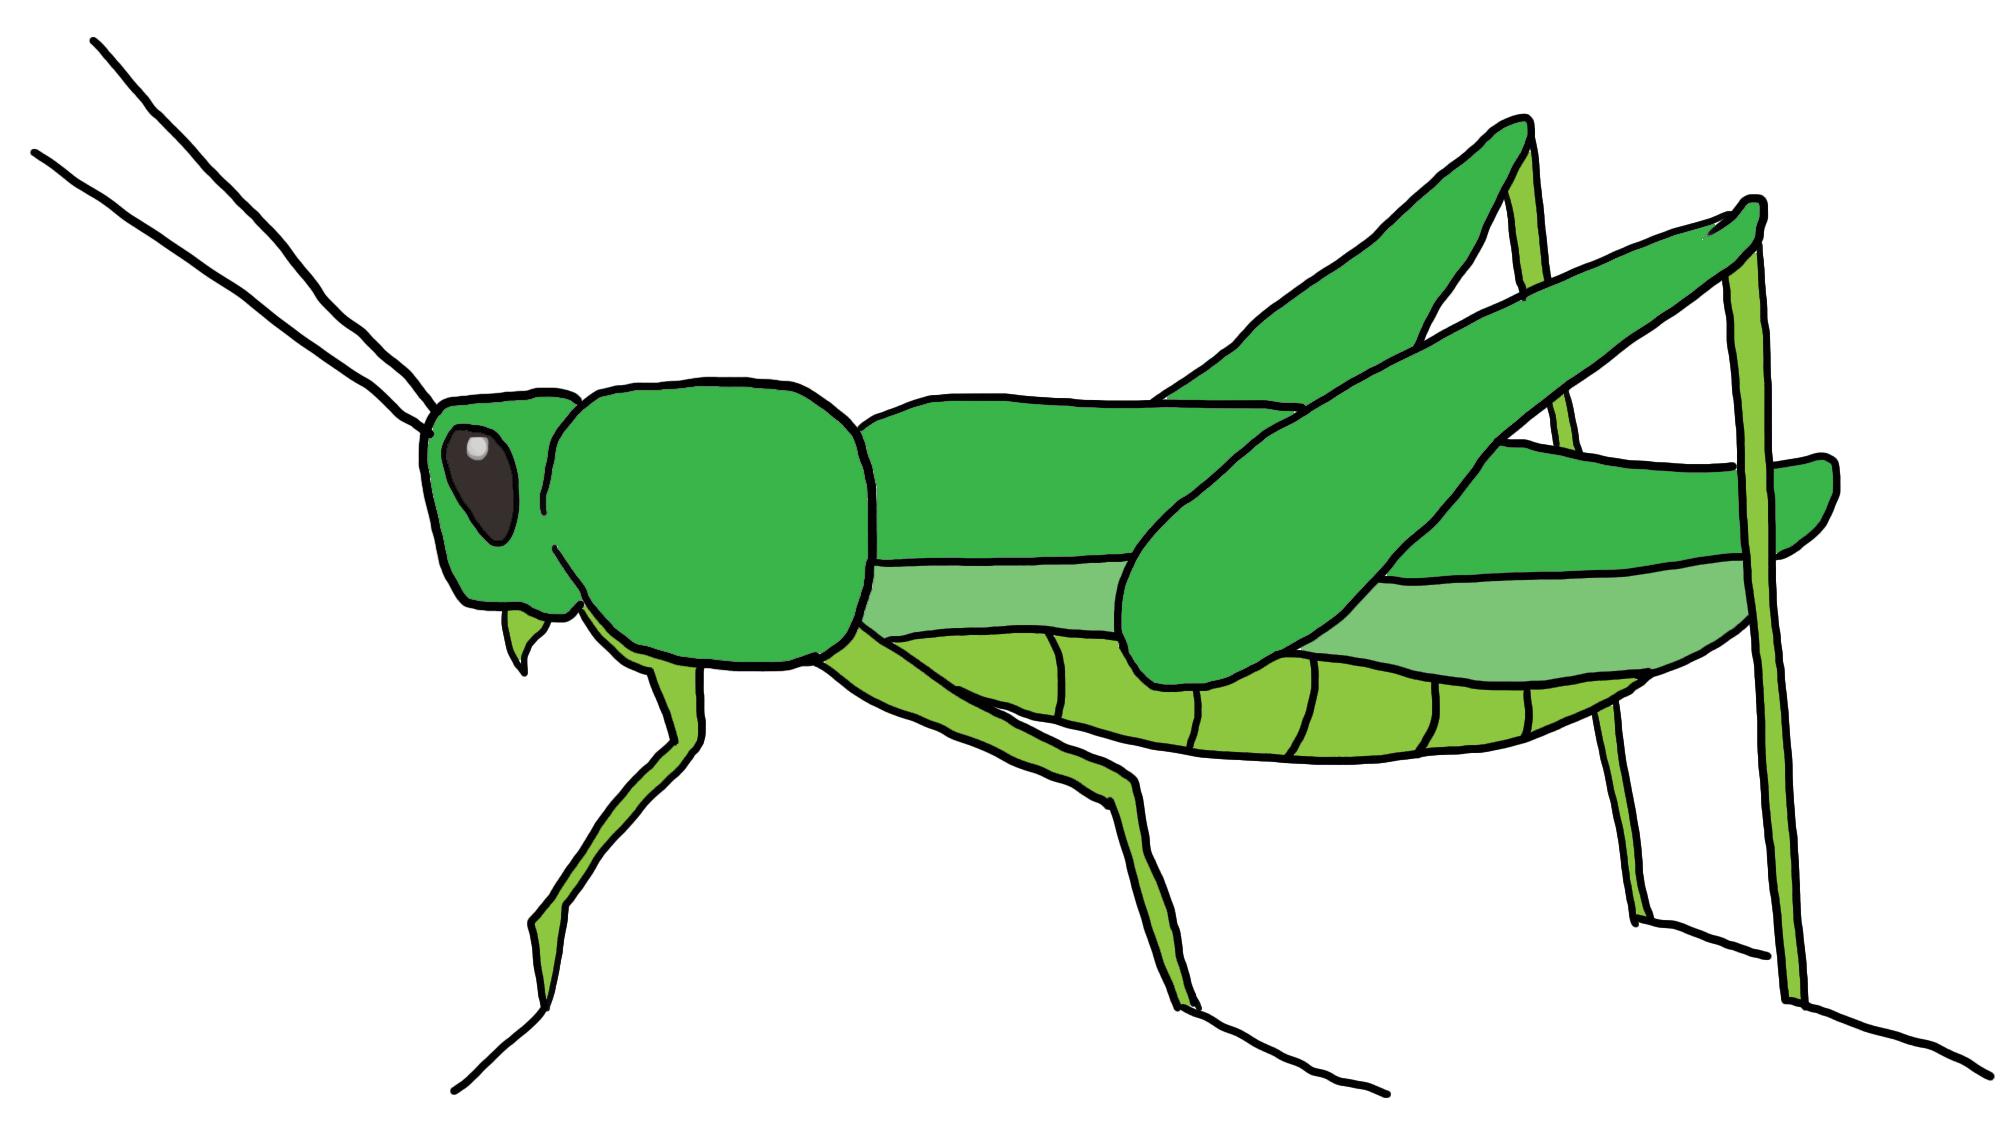 Clipart grasshopper clip art library stock Best Grasshopper Clipart #9847 - Clipartion.com clip art library stock